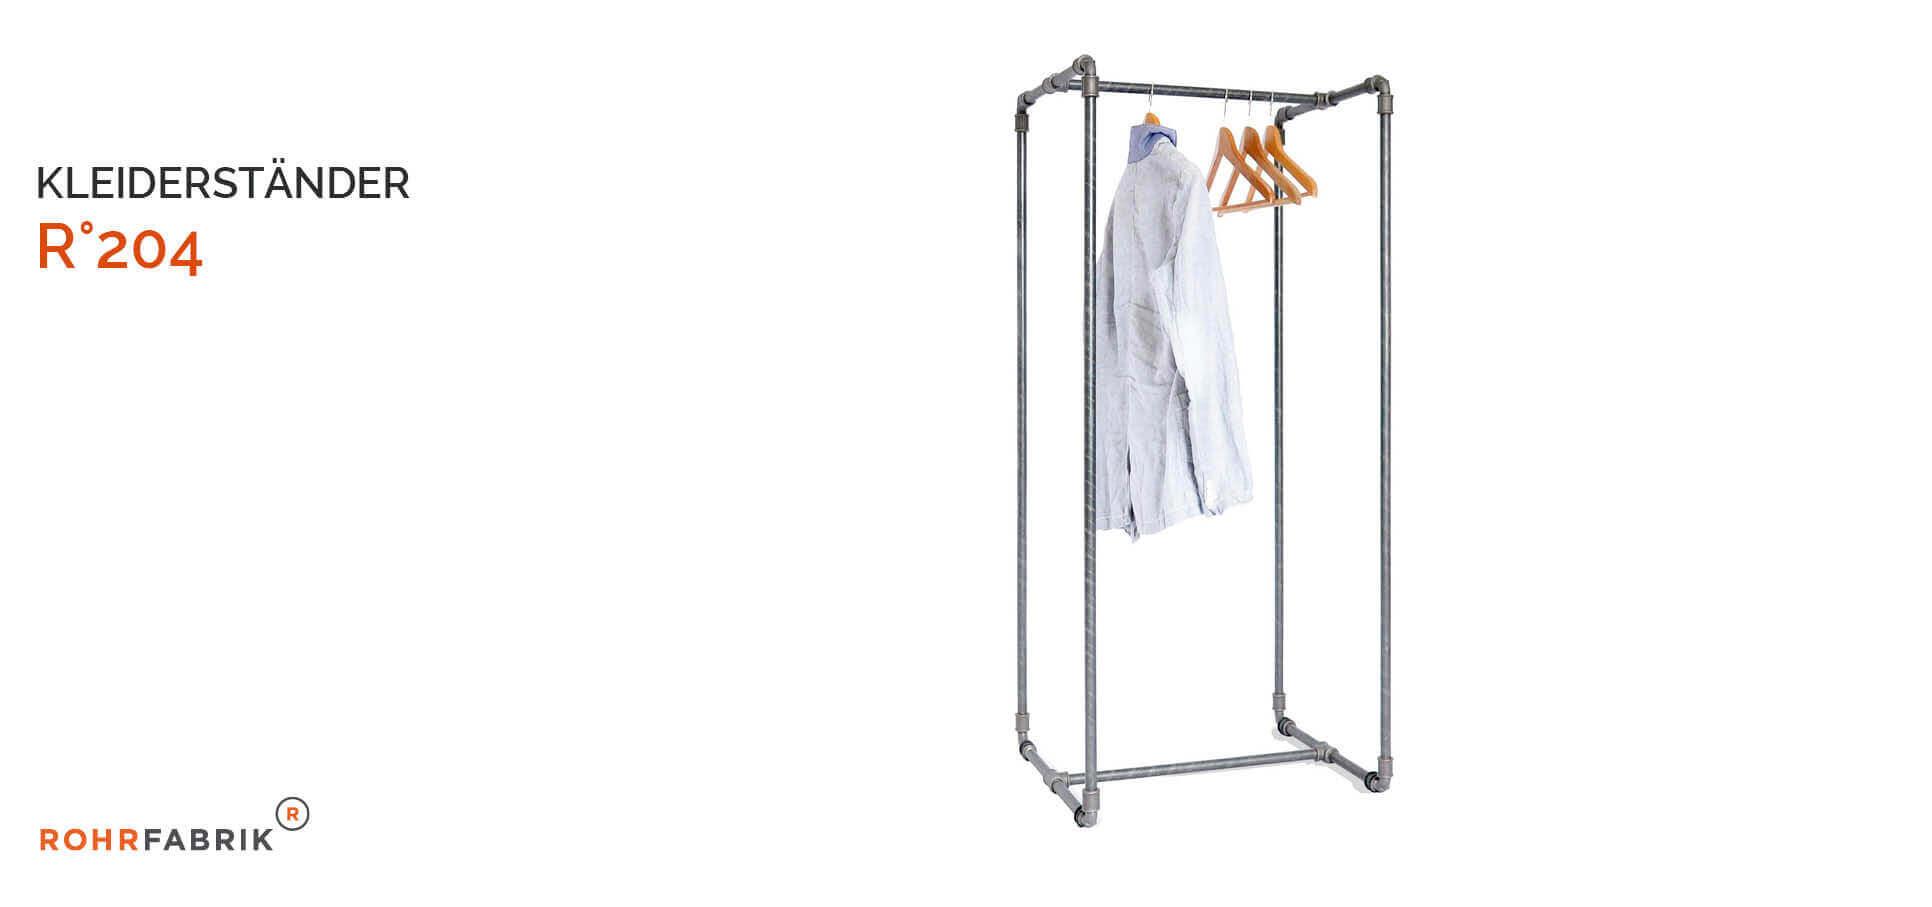 rohrfabrik-kleiderstaender-rohr-moebel-accessoire-design-interieur-ladenbau-garderobe-R204.jpg